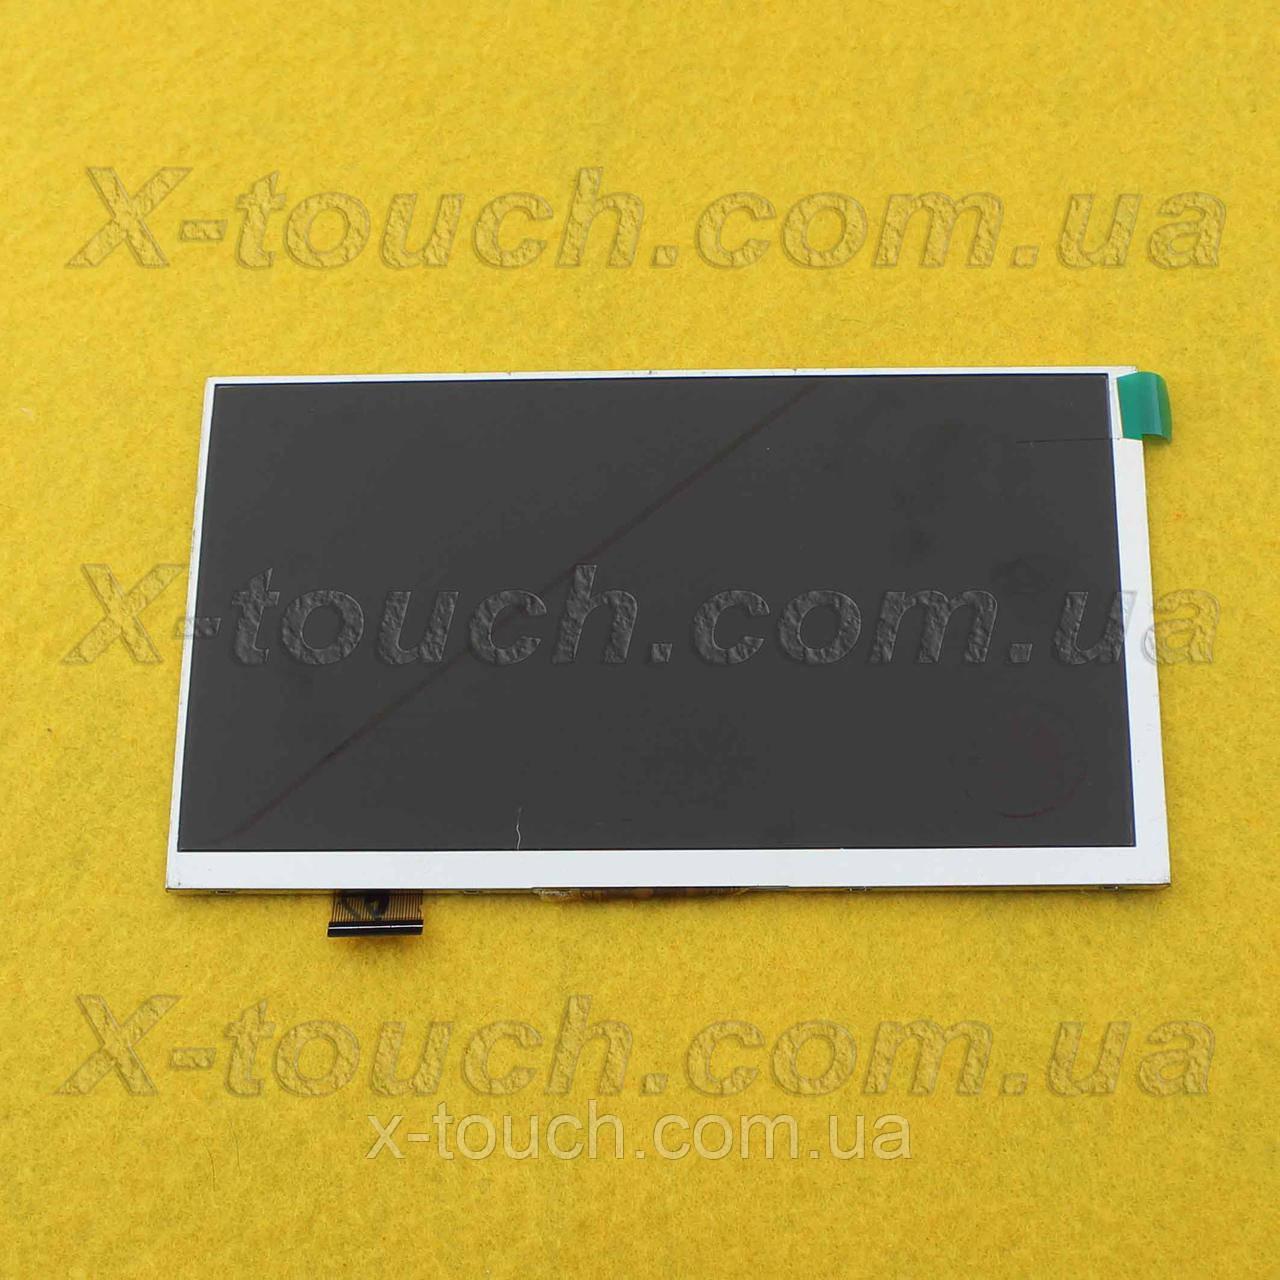 Матриця,екран, дисплей Bravis NB75 для планшета